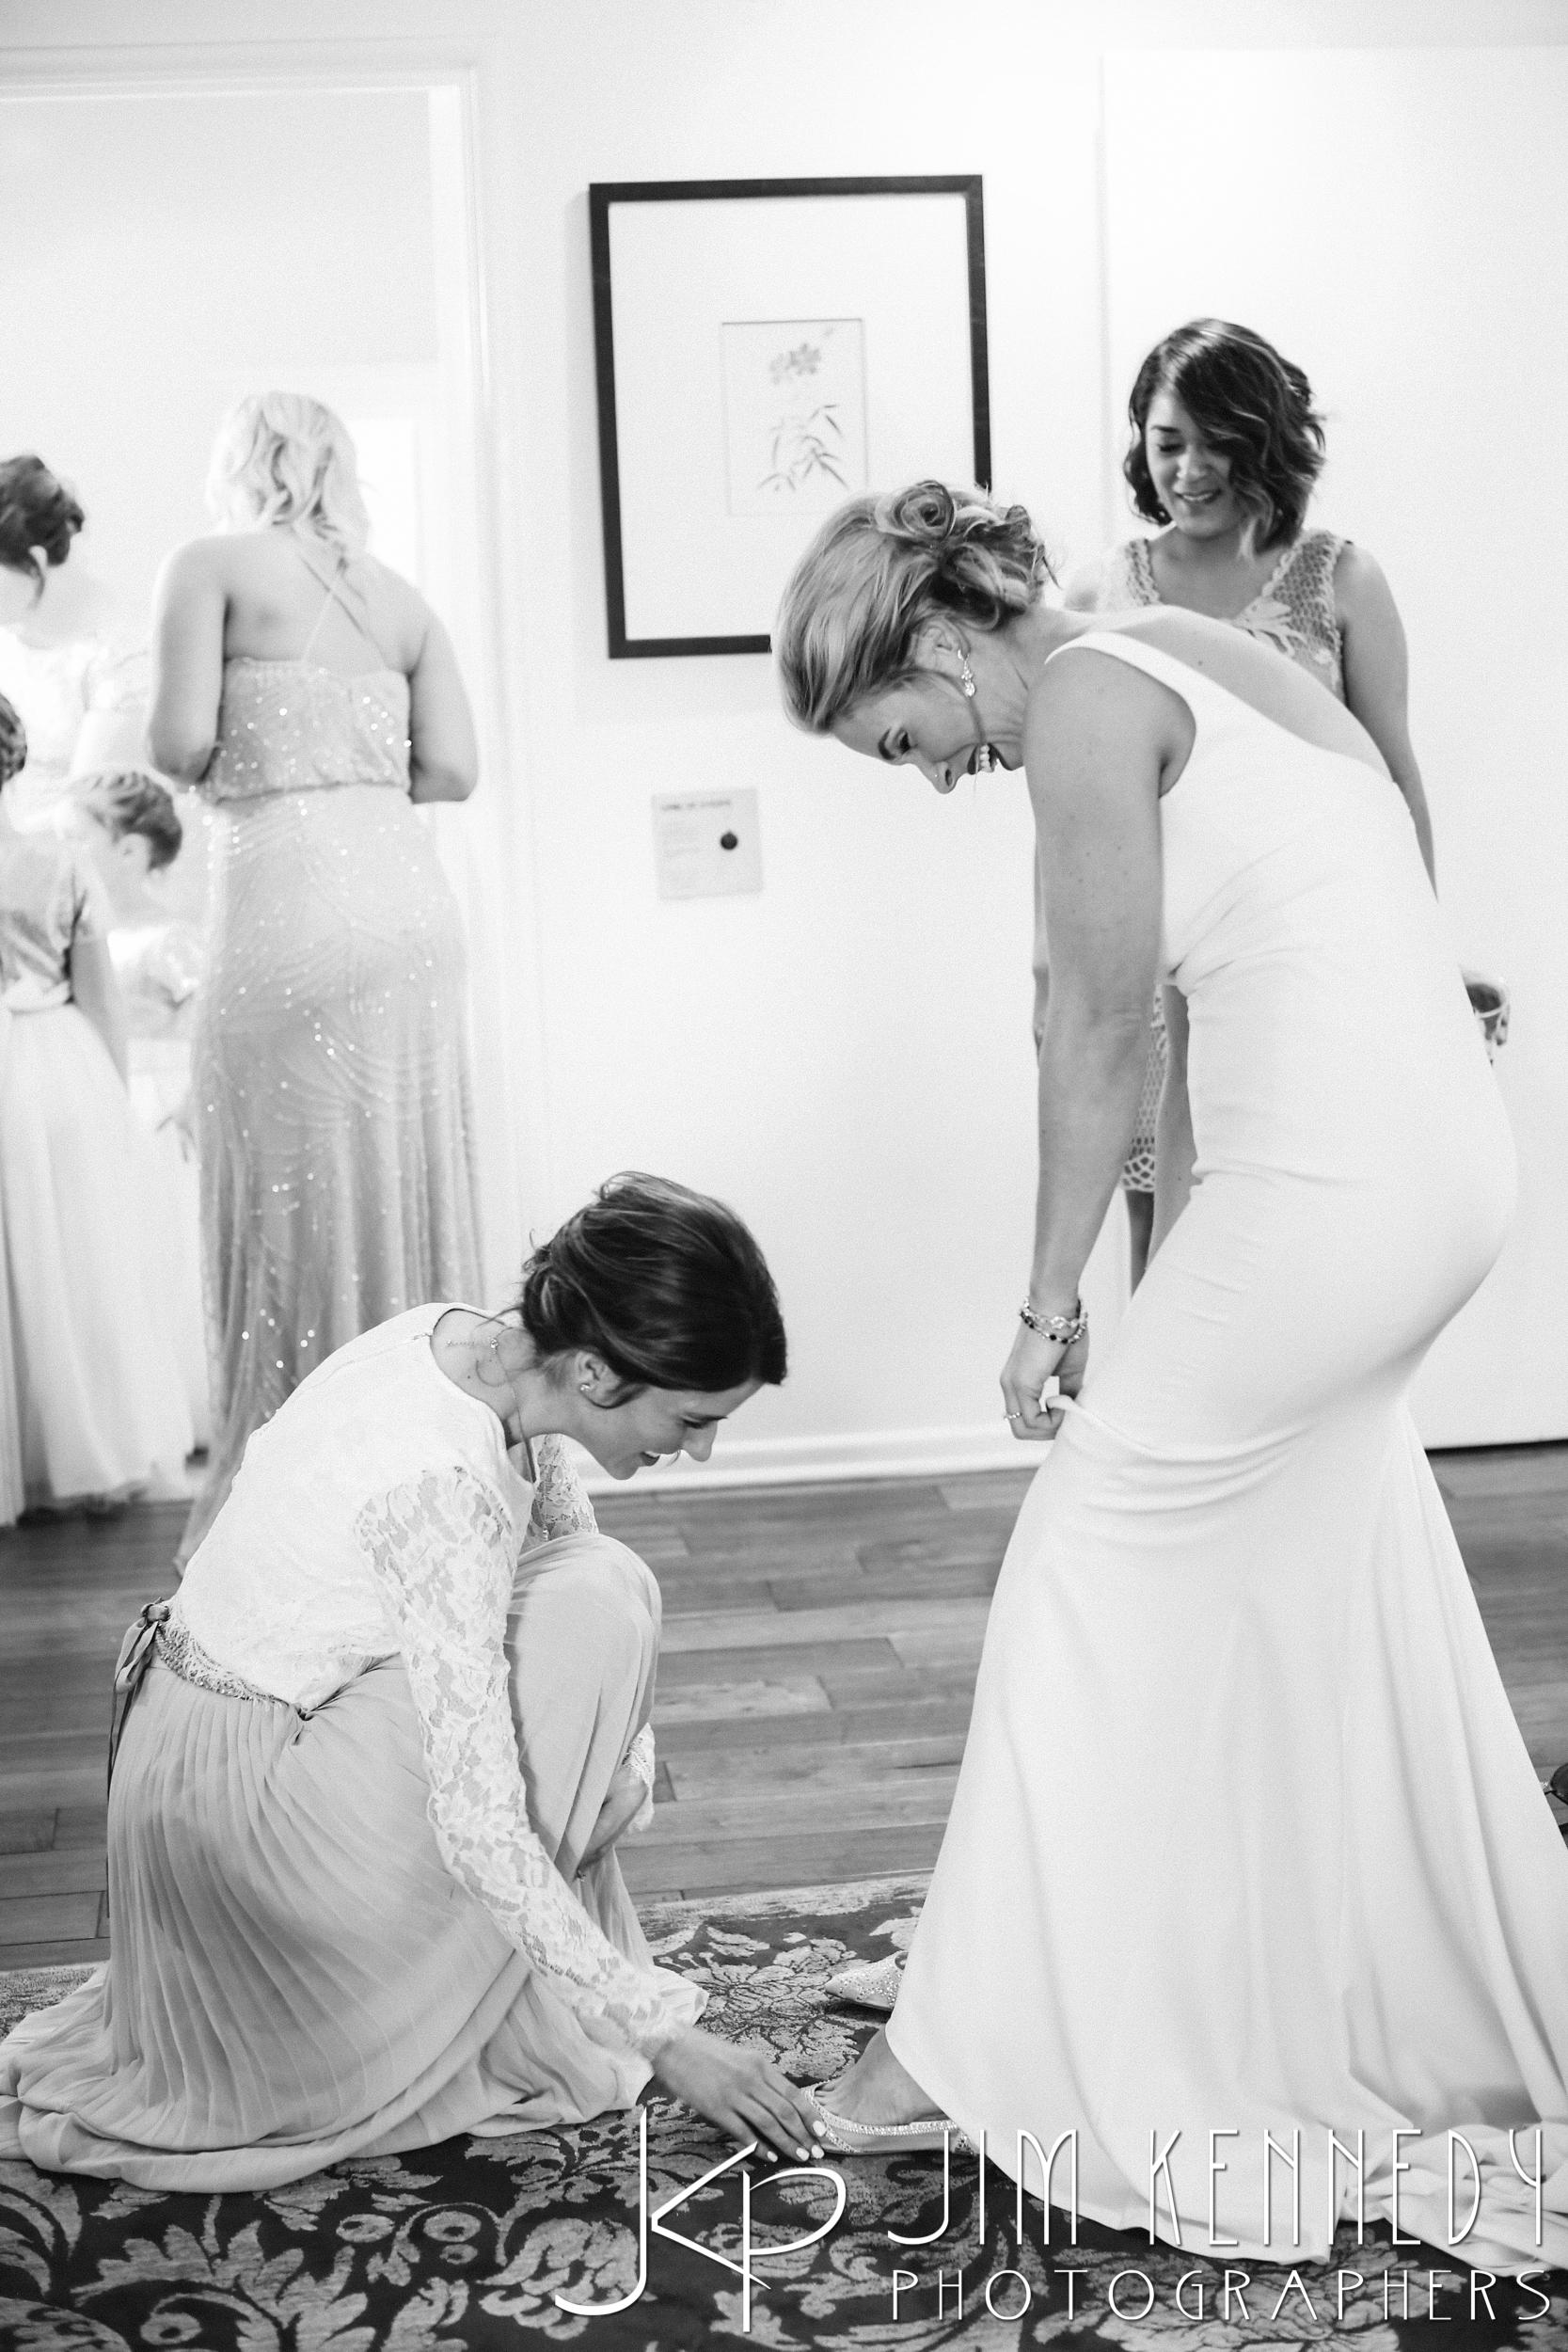 jim_kennedy_photographers_highland_springs_wedding_caitlyn_0050.jpg